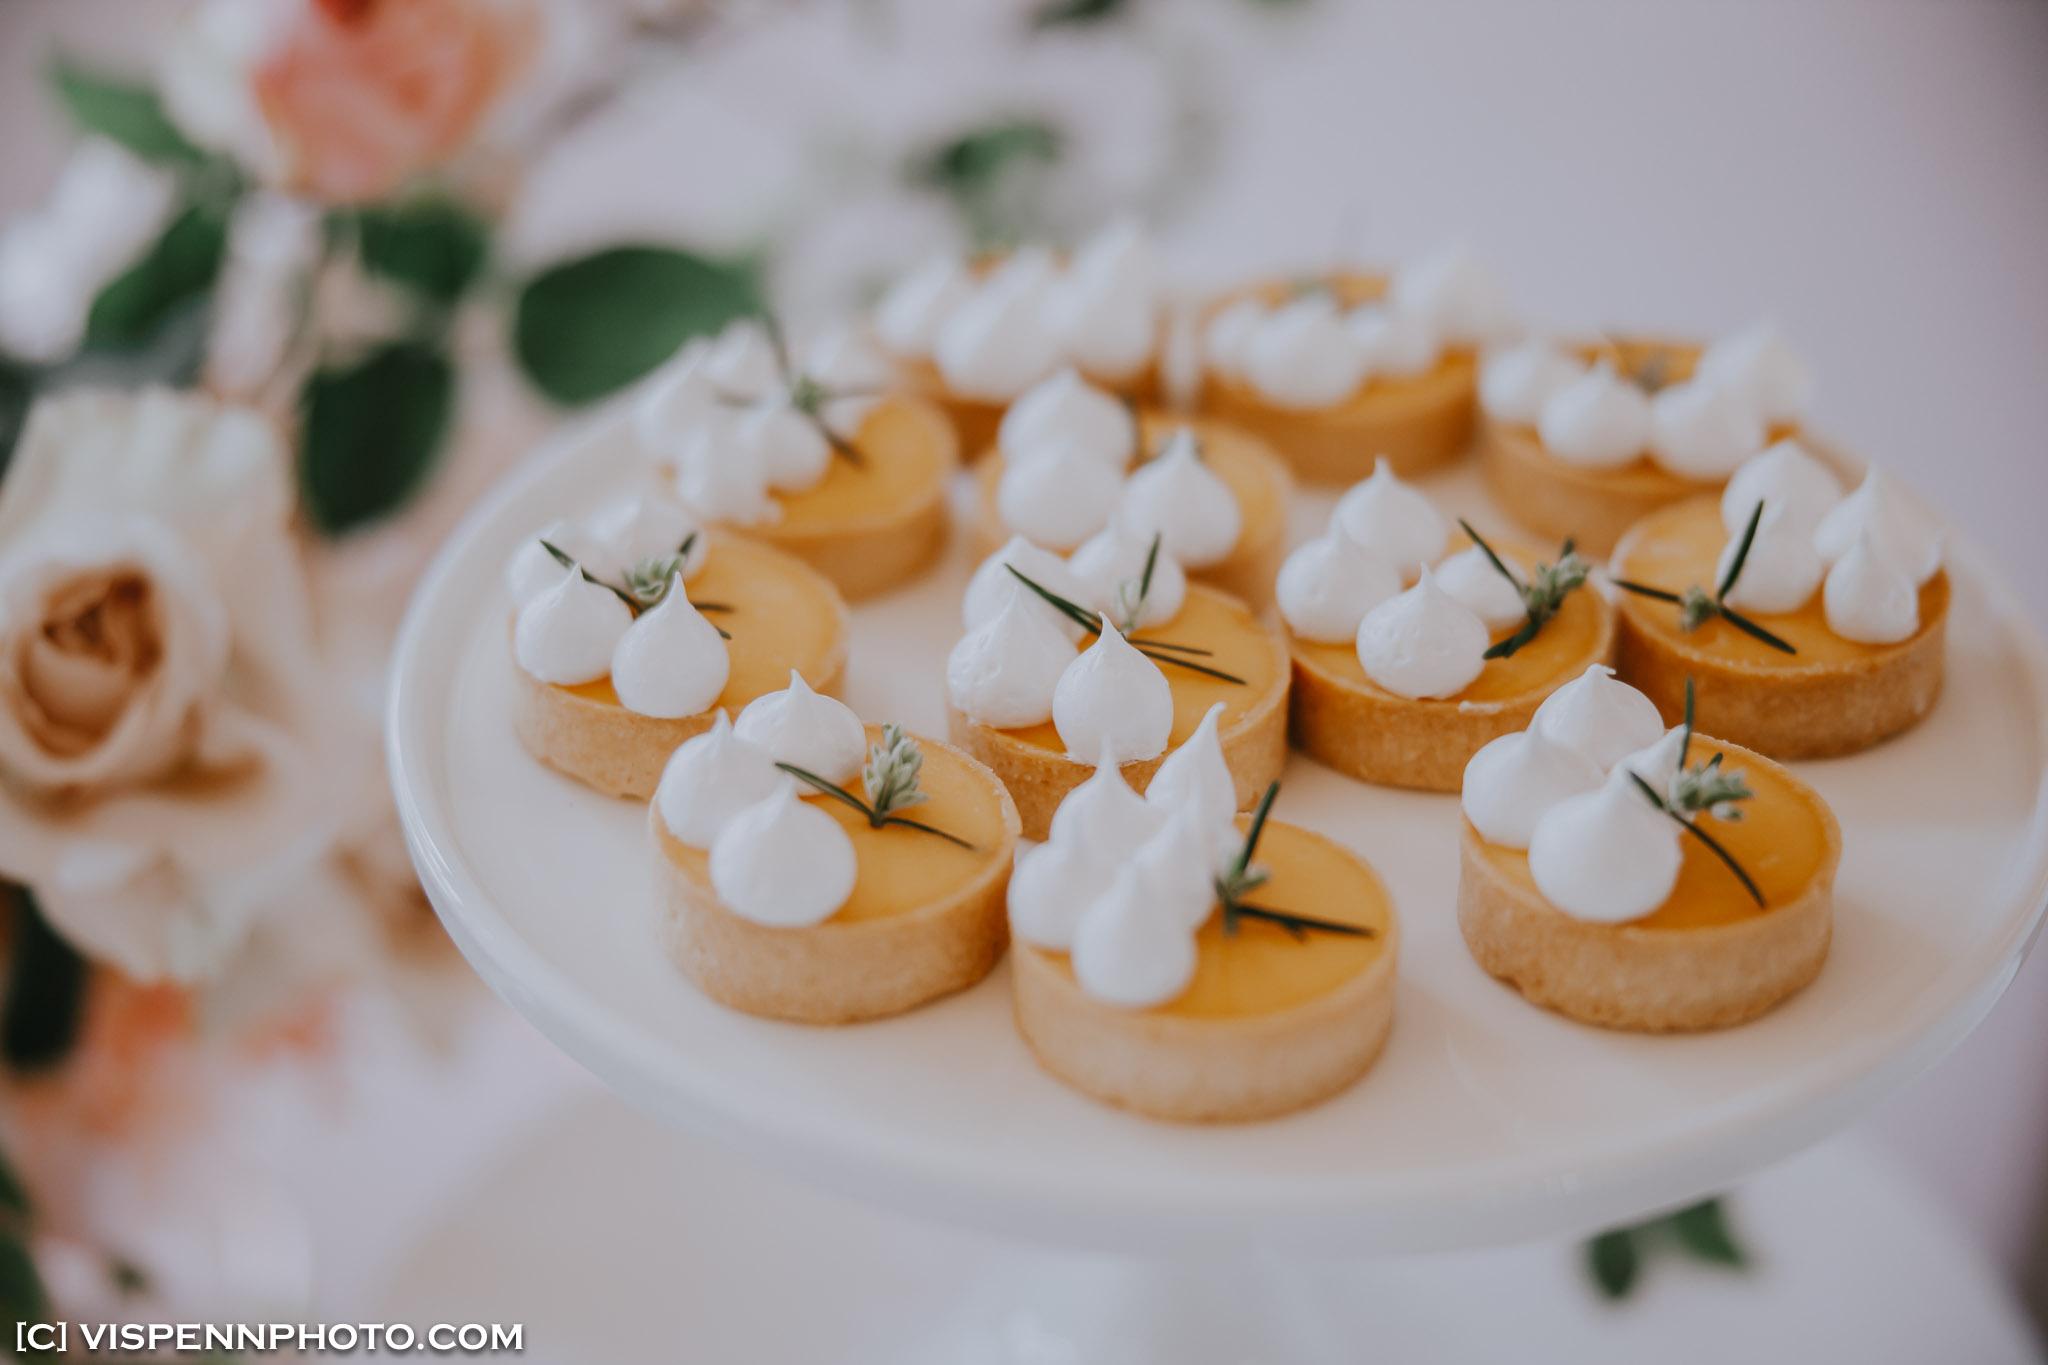 WEDDING DAY Photography Melbourne VISPENN 墨尔本 婚礼跟拍 婚礼摄像 婚礼摄影 结婚照 登记照 ElitaPB 06858 1P EOSR VISPENN